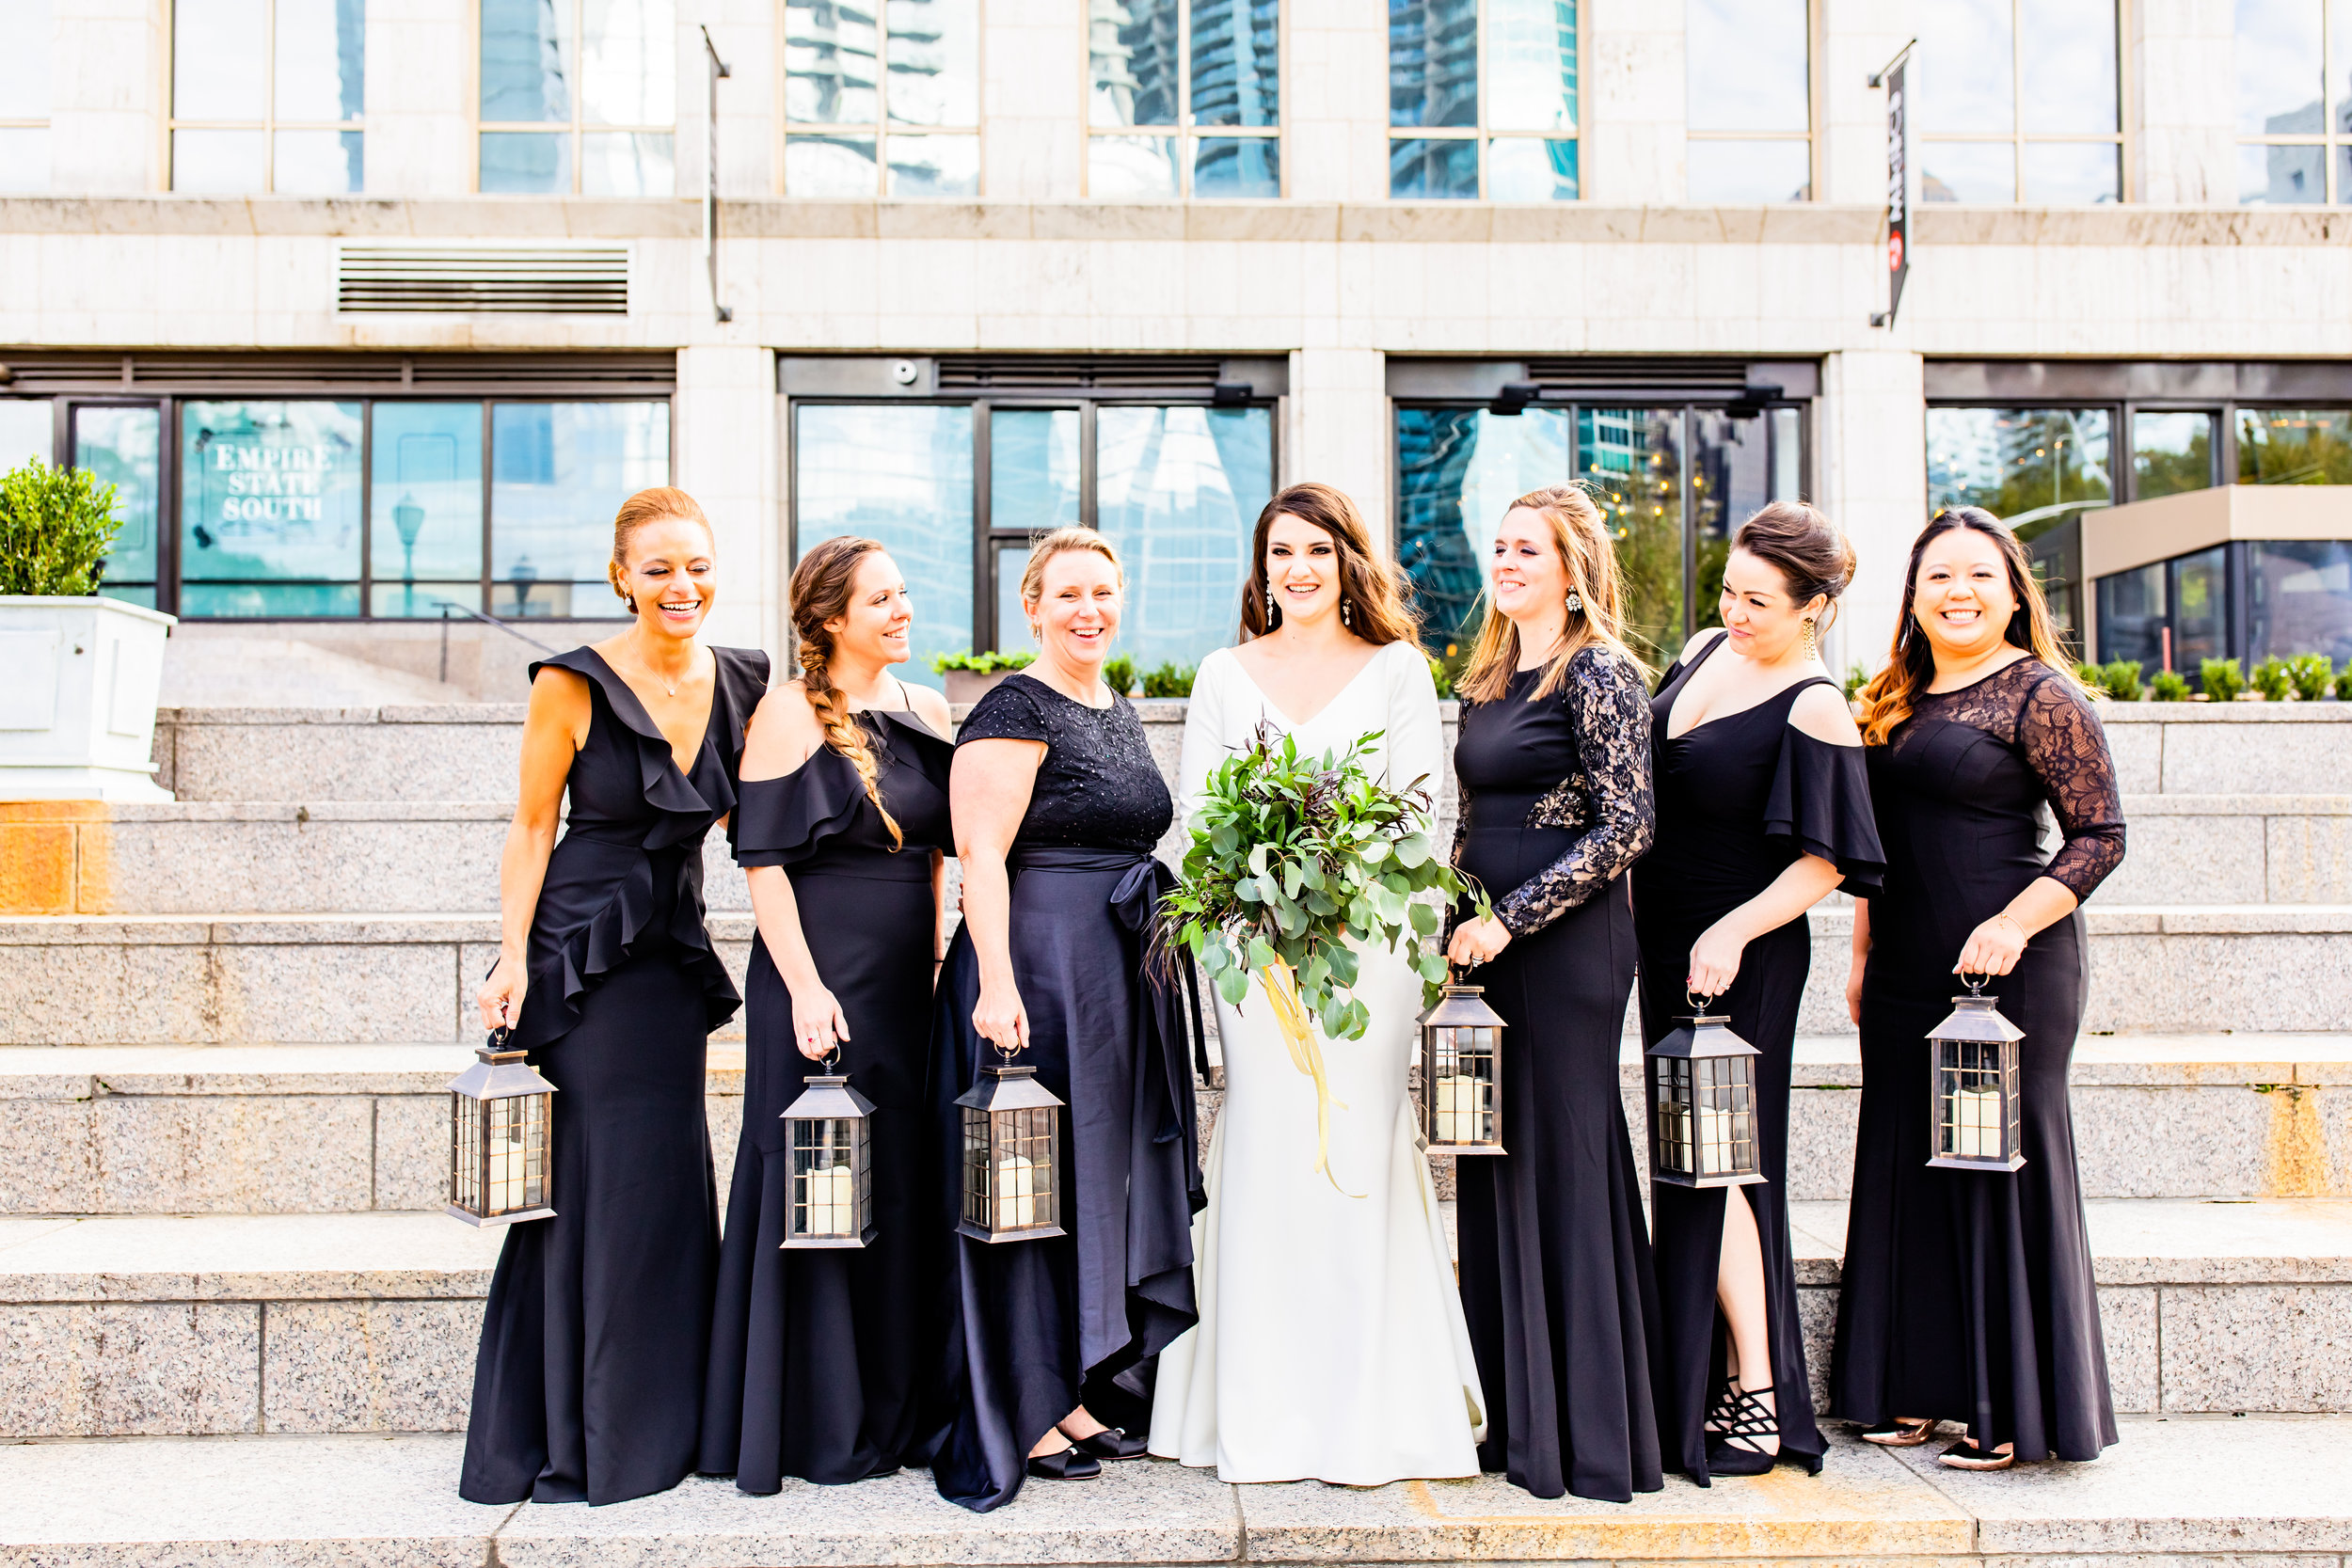 Wedding_Atlanta_Emily_Lester_Photography-283.jpg